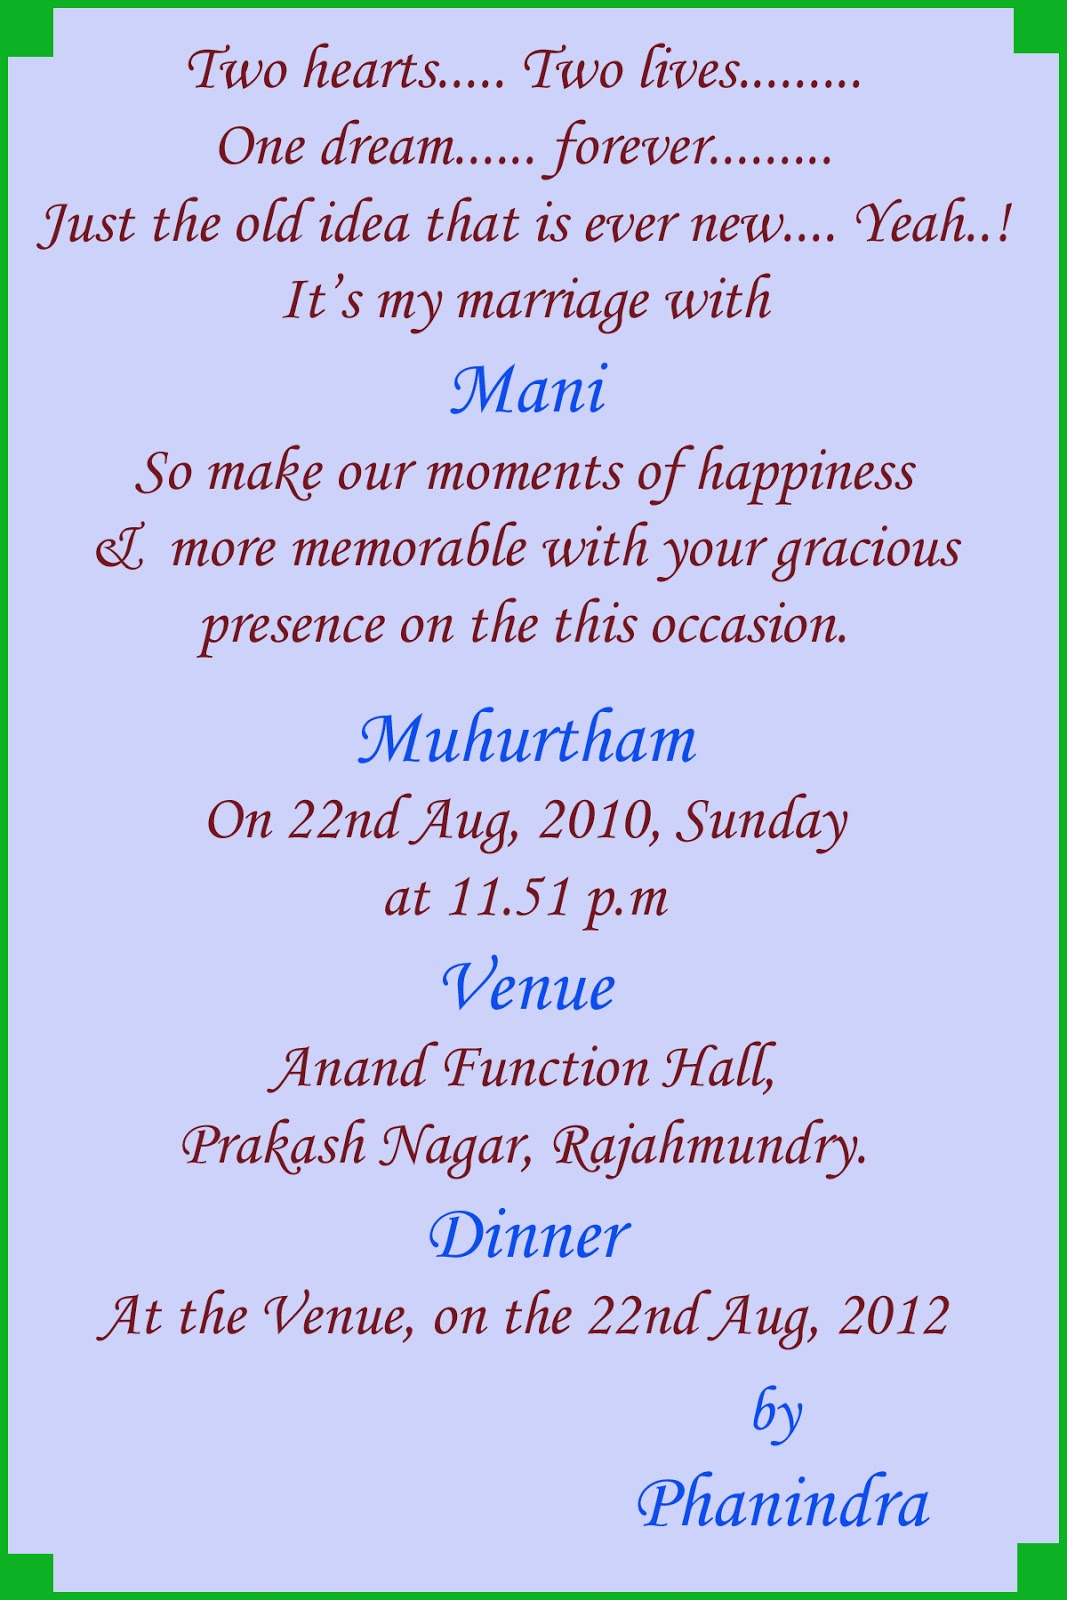 Invitation Cards For Vastu Shanti View Original Updated On 10 4